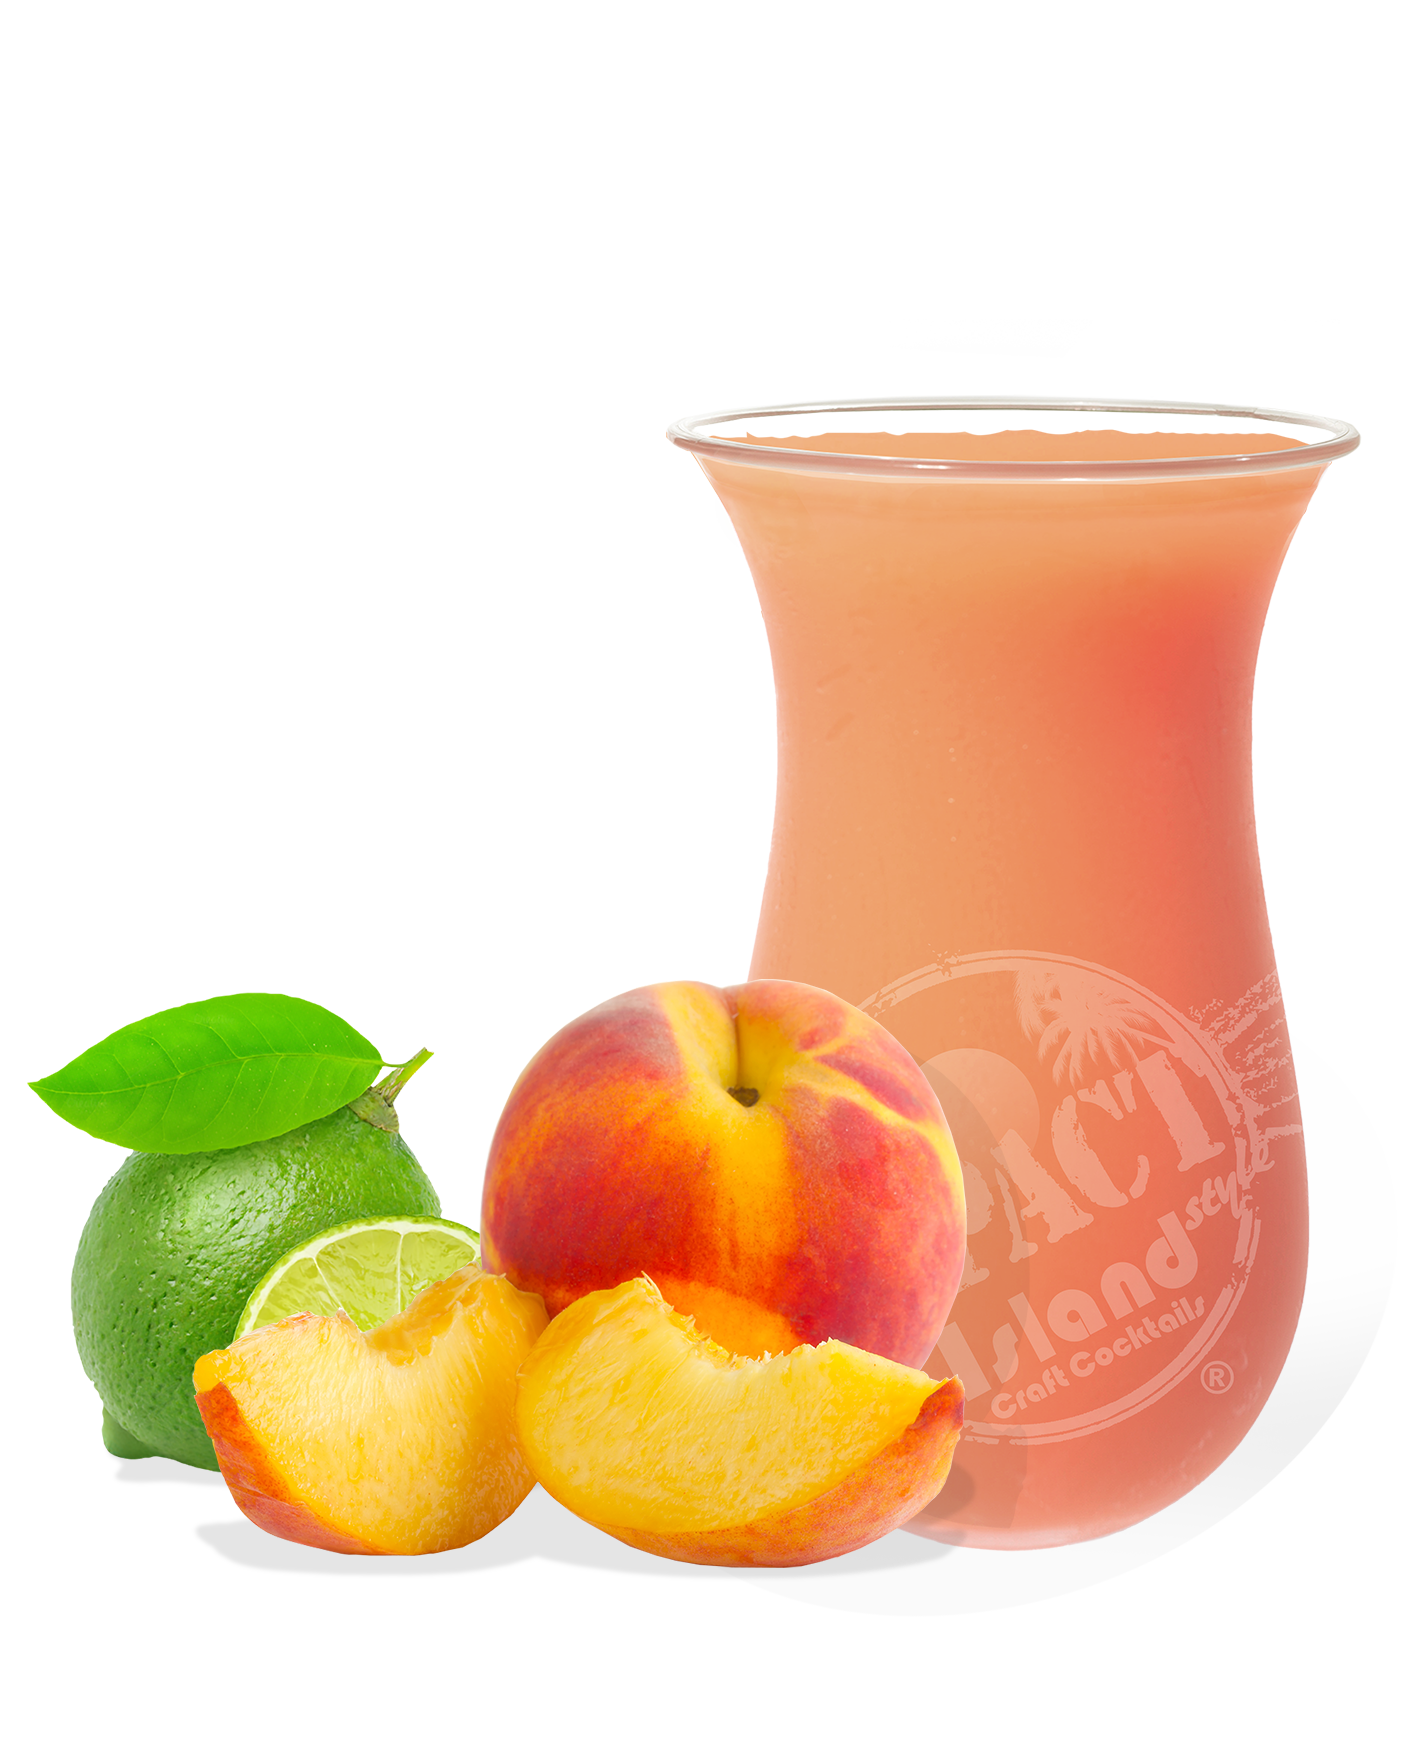 Island-Style Peach